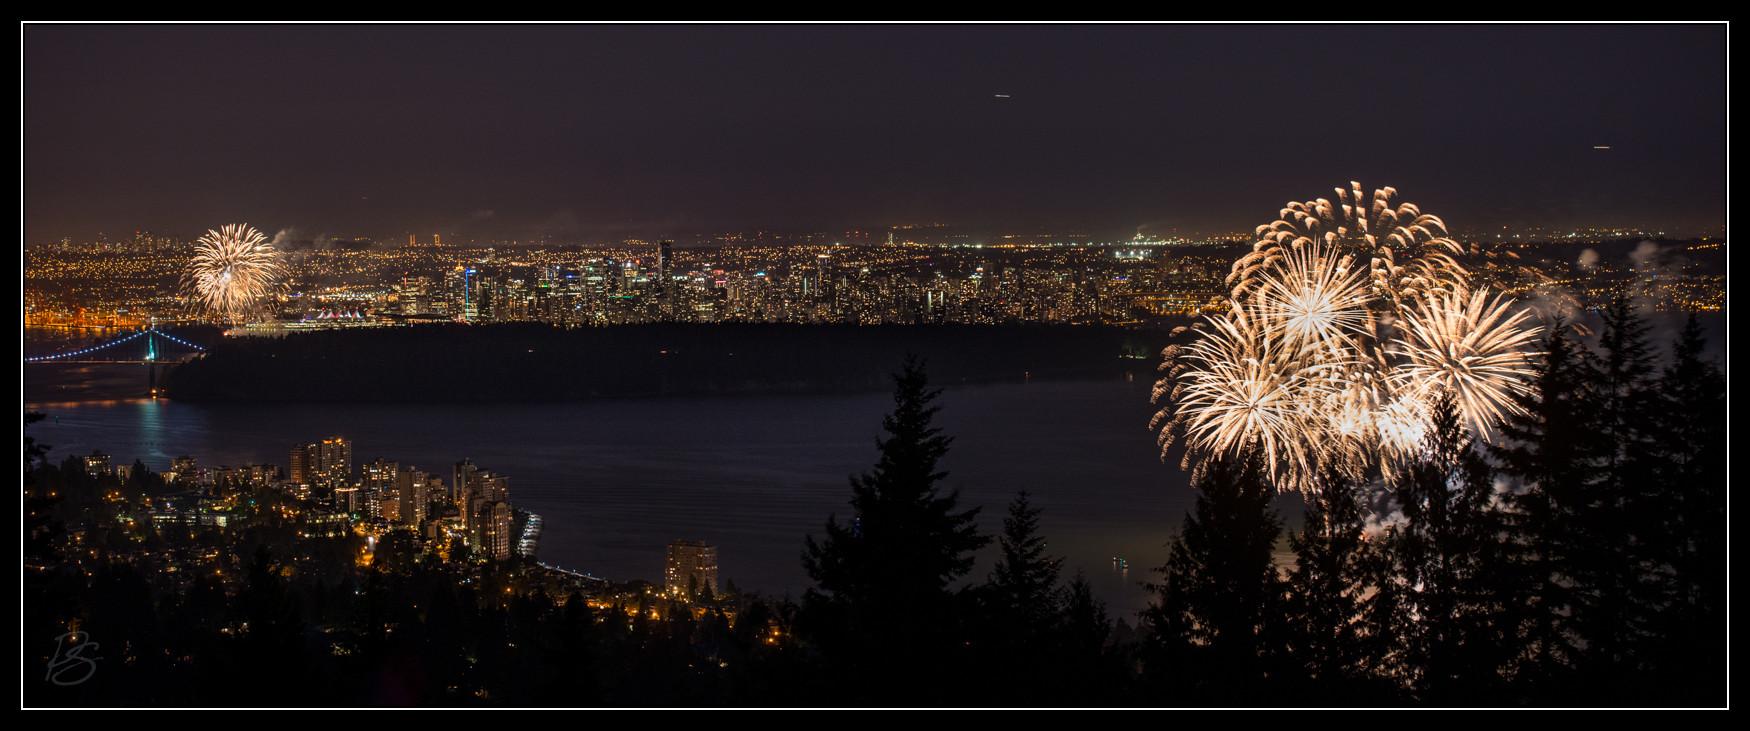 Canada Day Burrard Inlet Fireworks